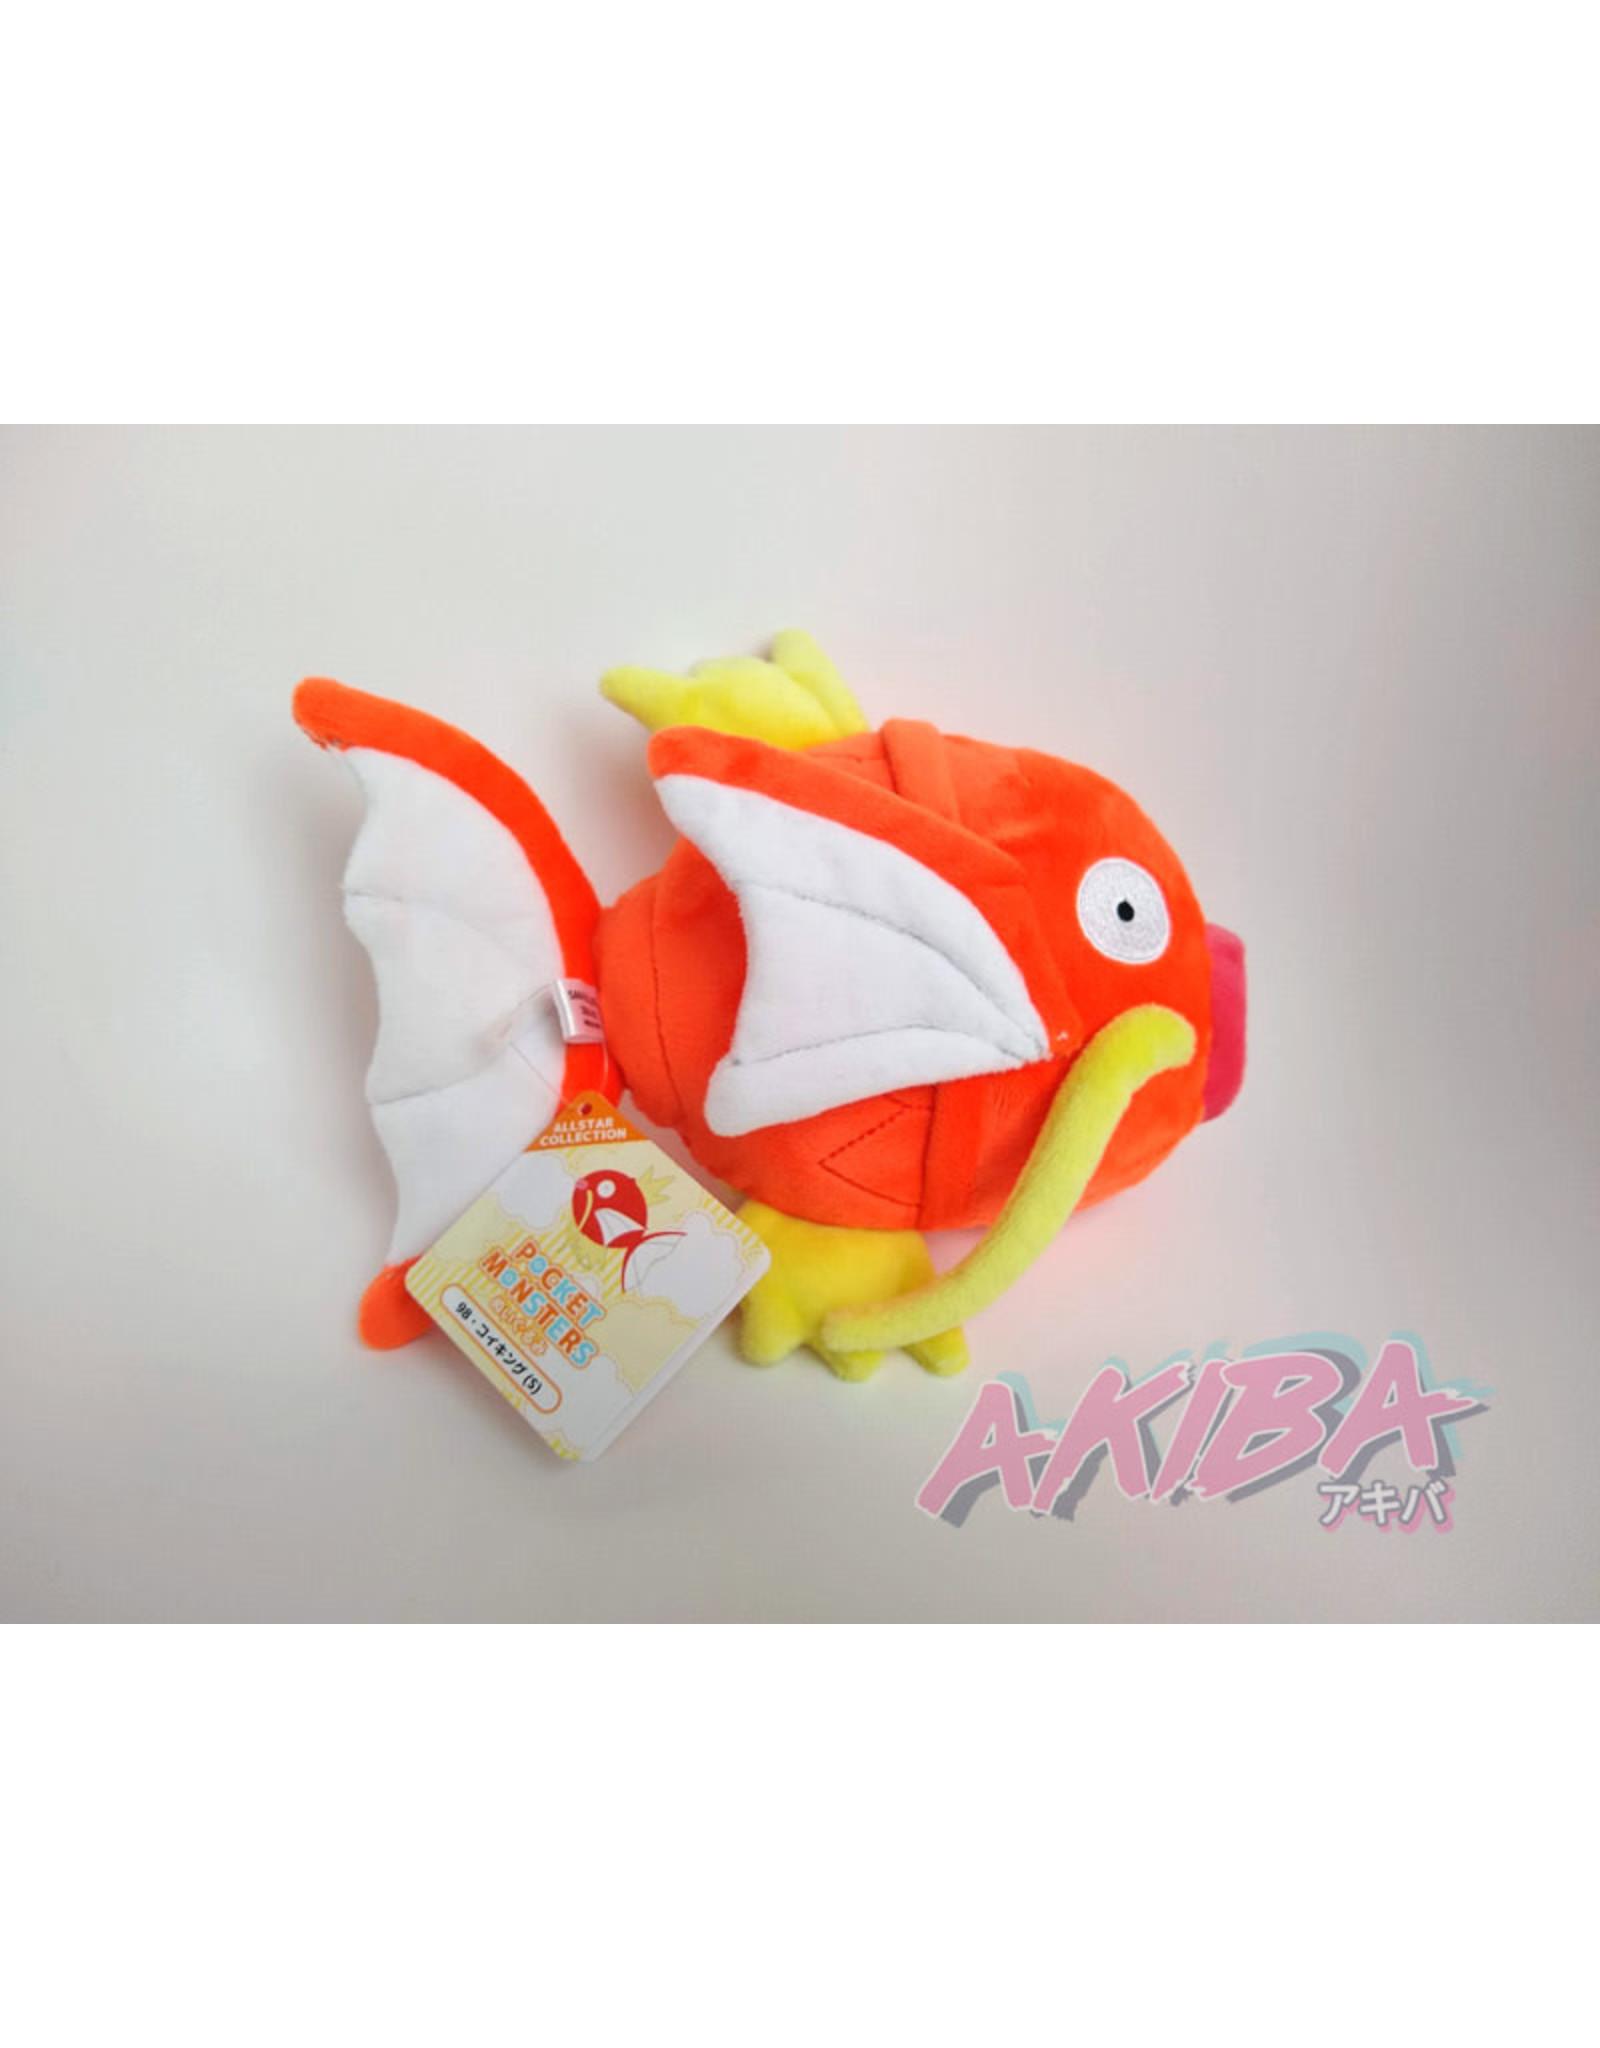 Magikarp - Pokemon Plushie - 21cm (Japanese import)